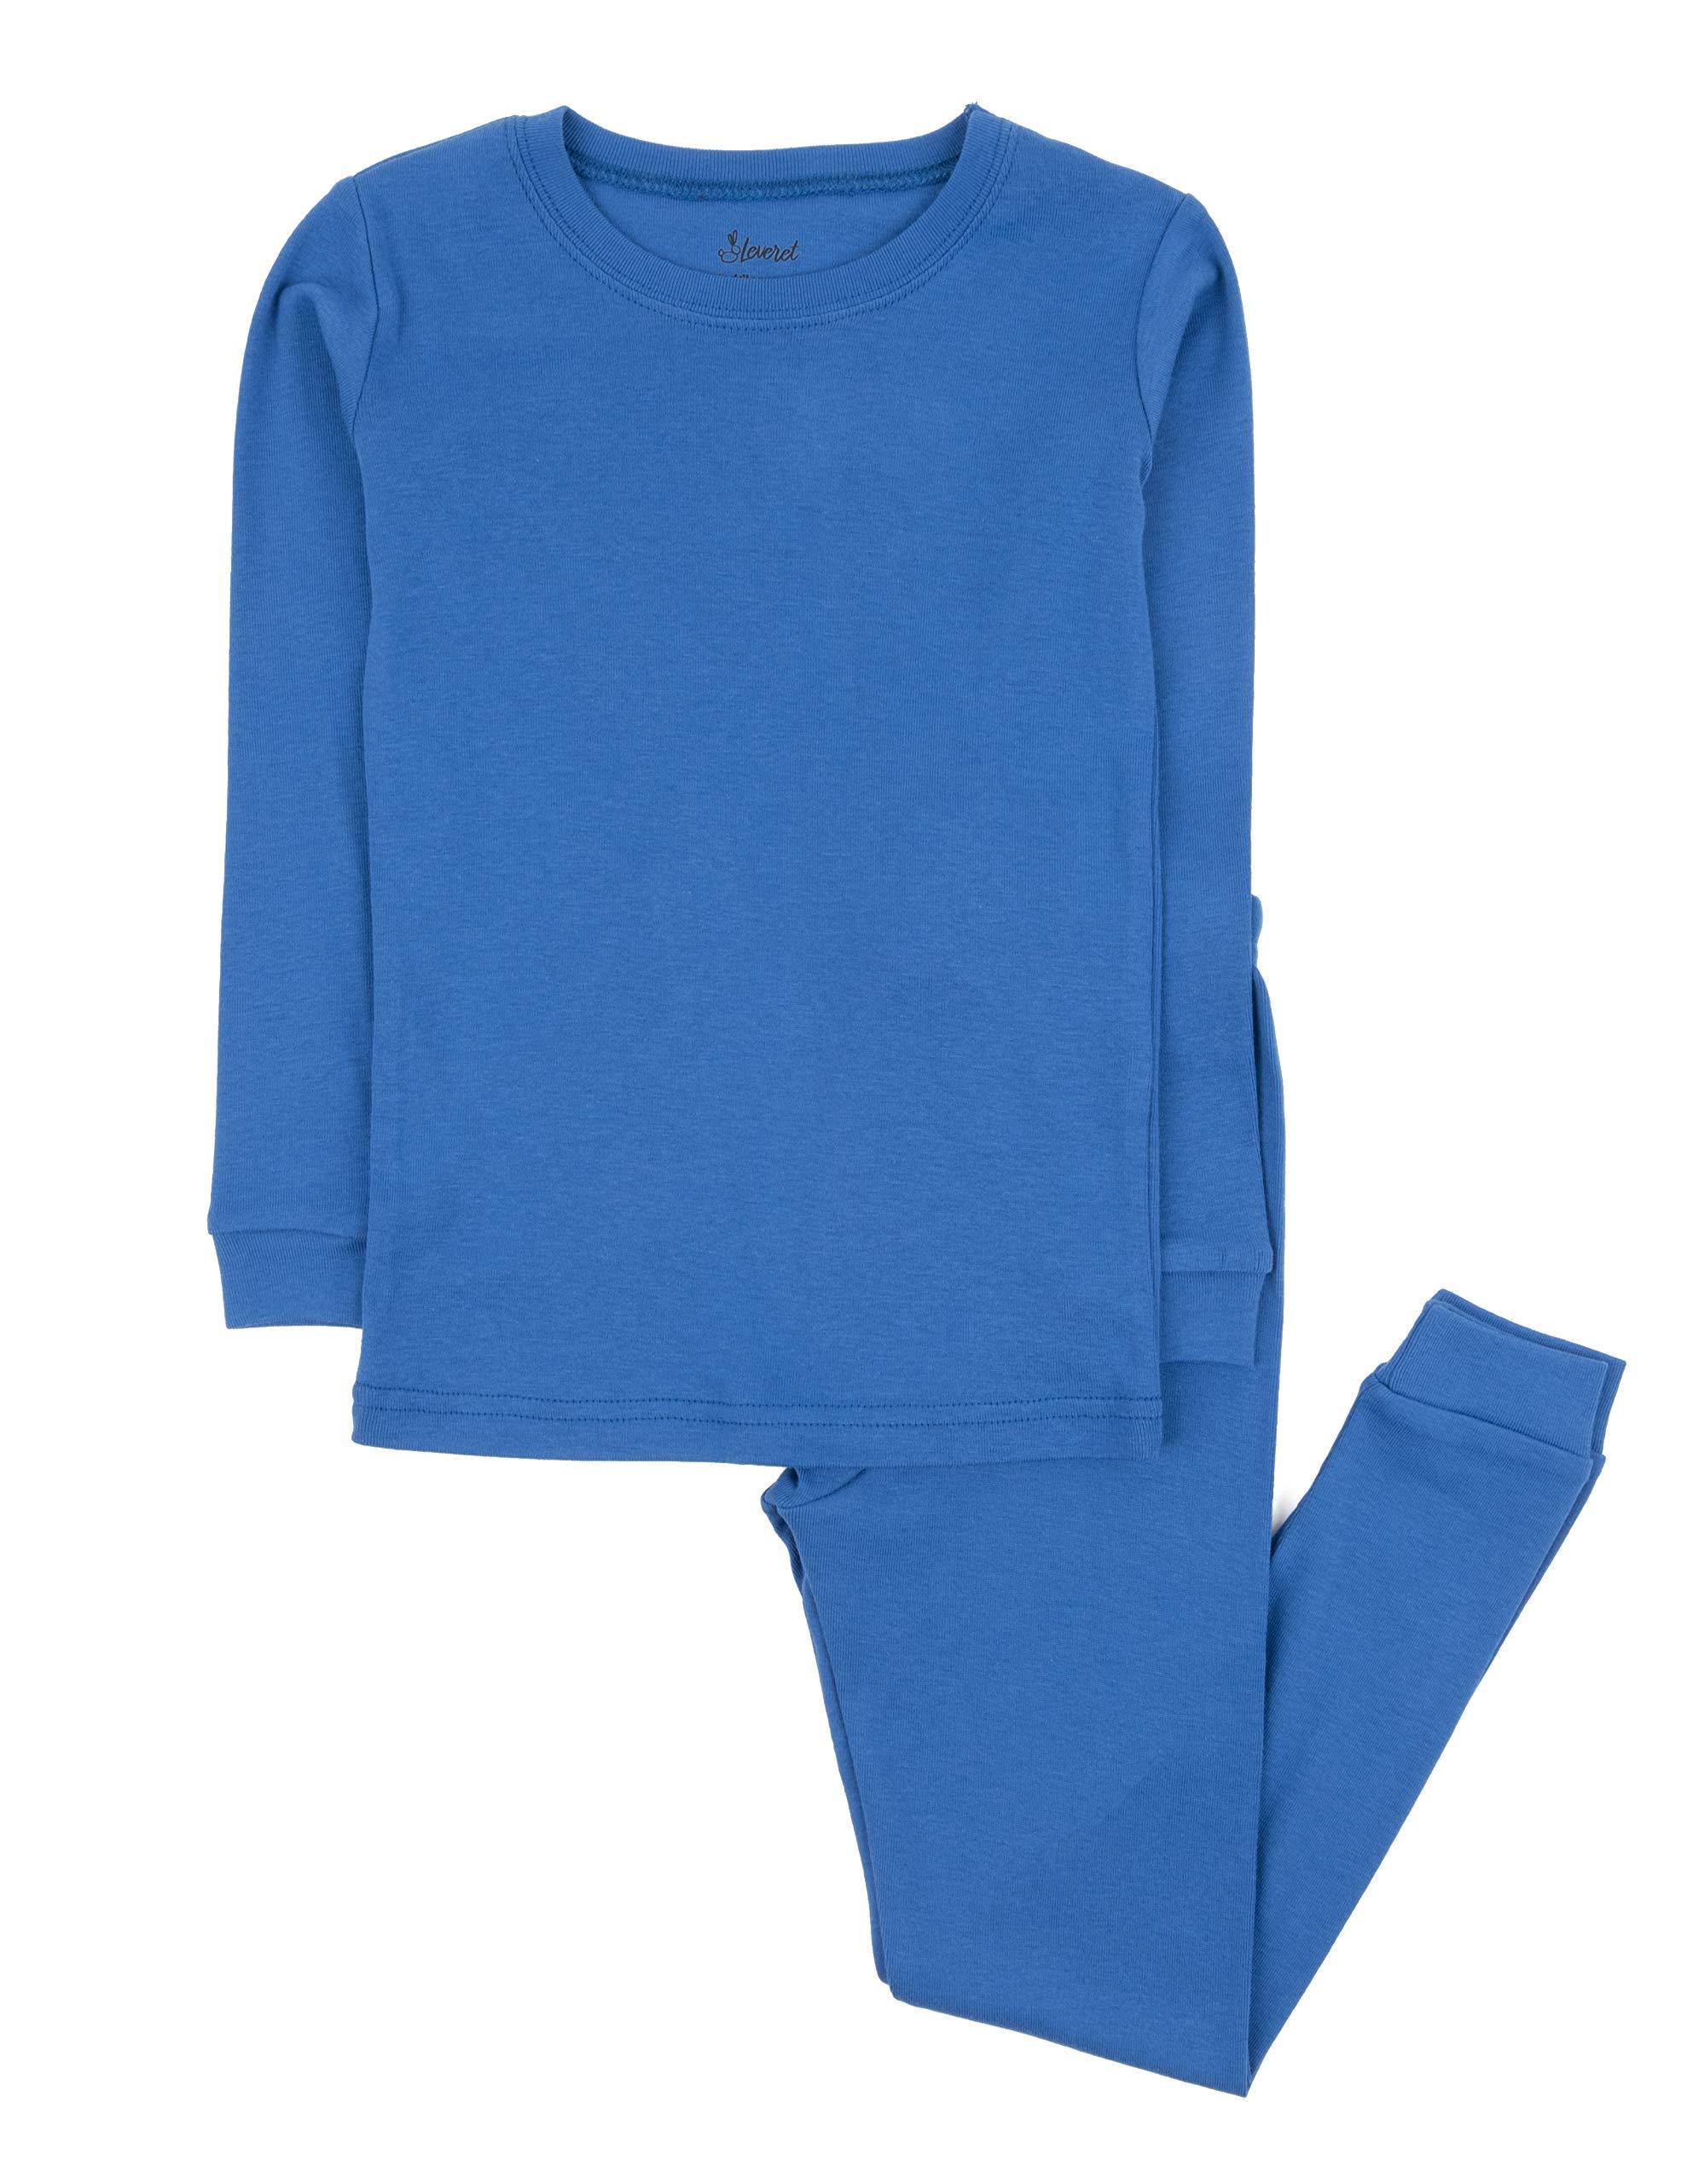 Leveret Kids Pajamas Boys & Girls Solid Colors 2 Piece ...